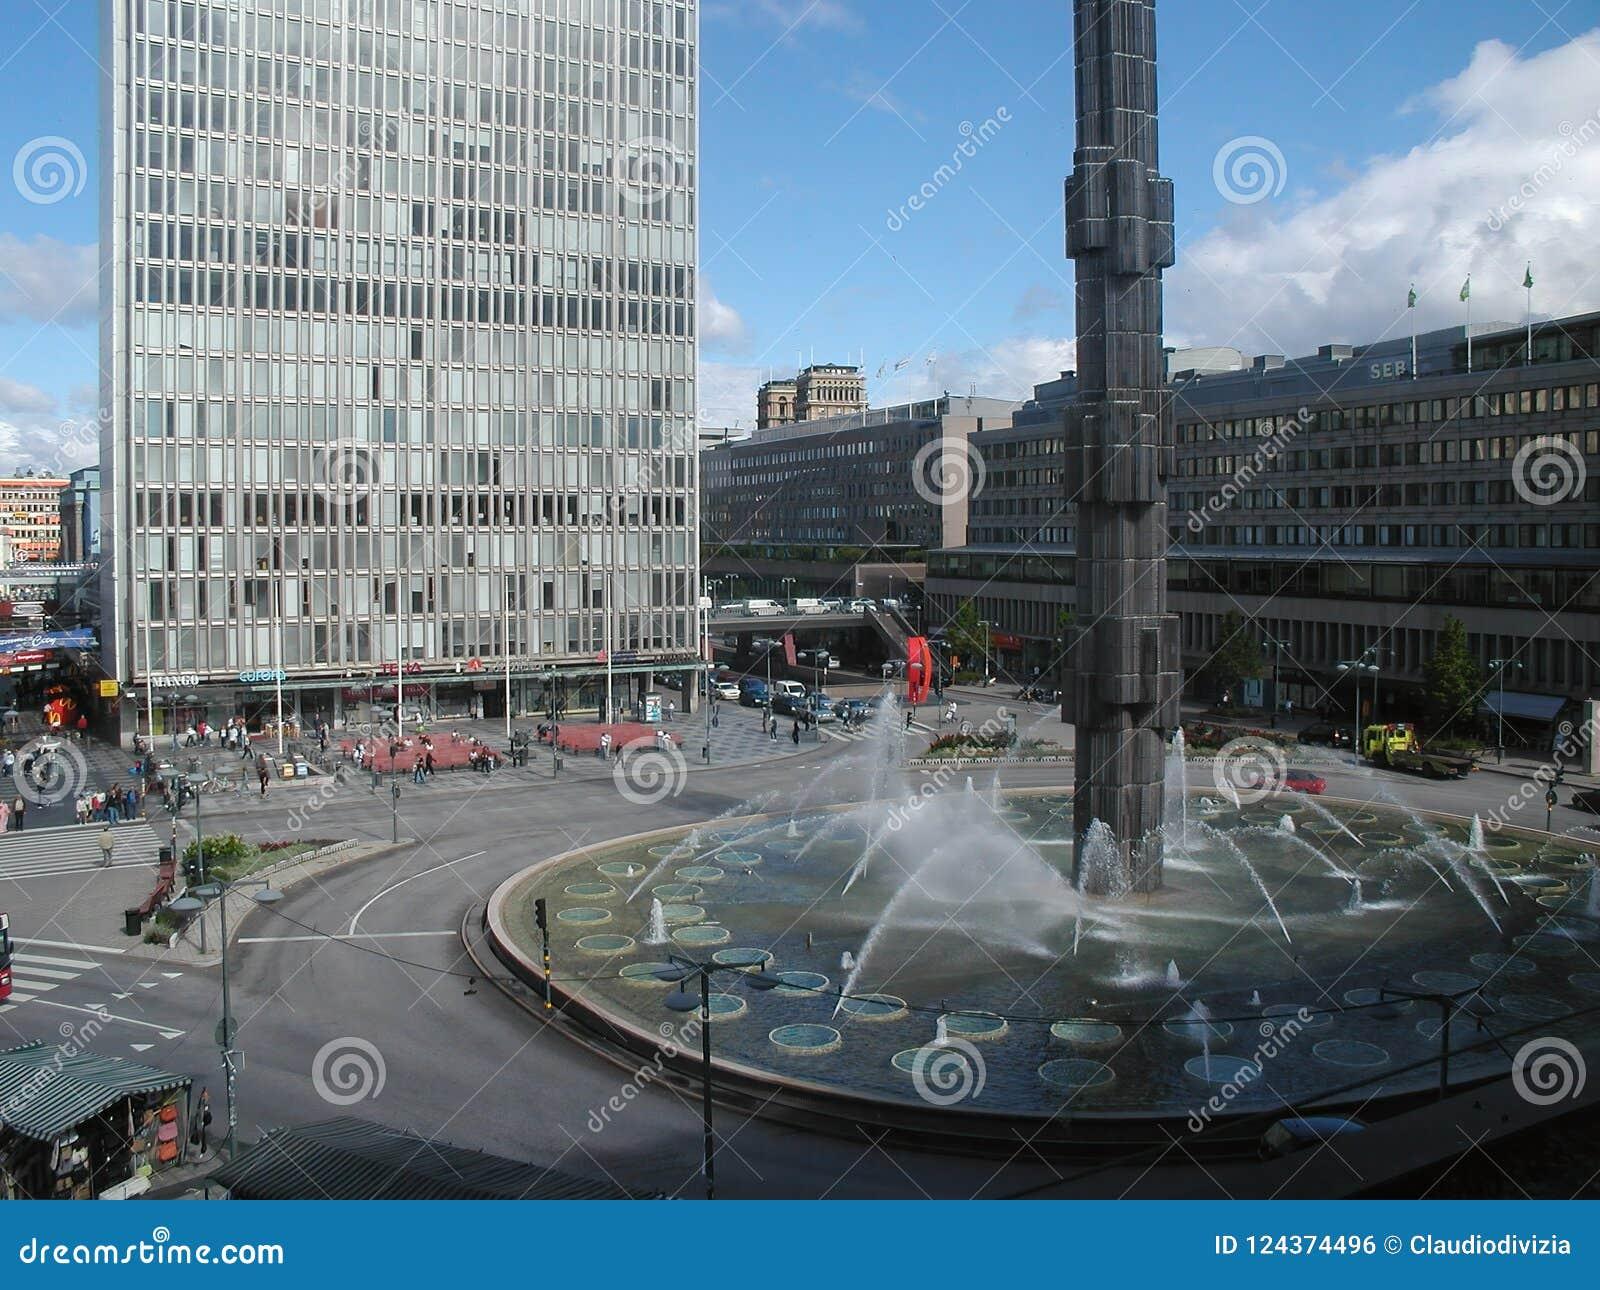 caf8acbf8d1 Sergels Torg Square In Stockholm Editorial Photo - Image of landmark ...